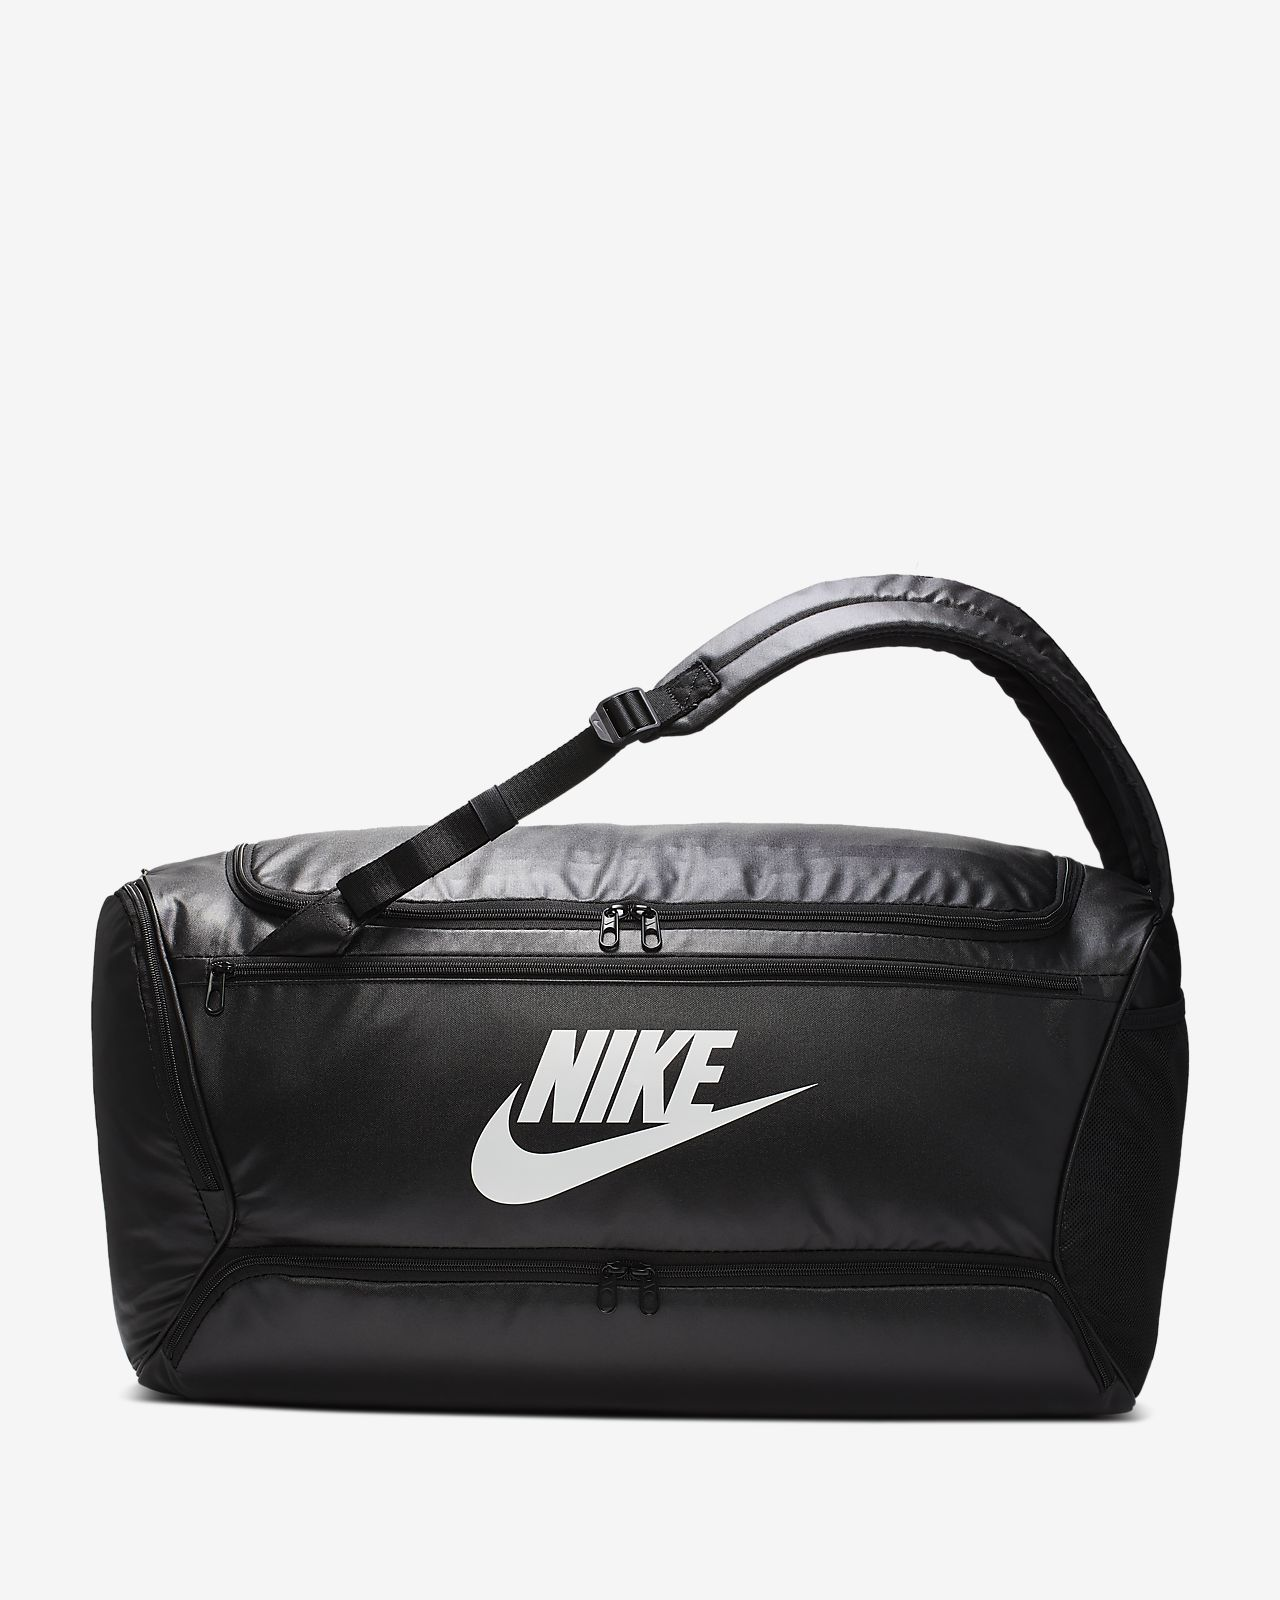 Borsone/zaino convertibile da training Nike Brasilia